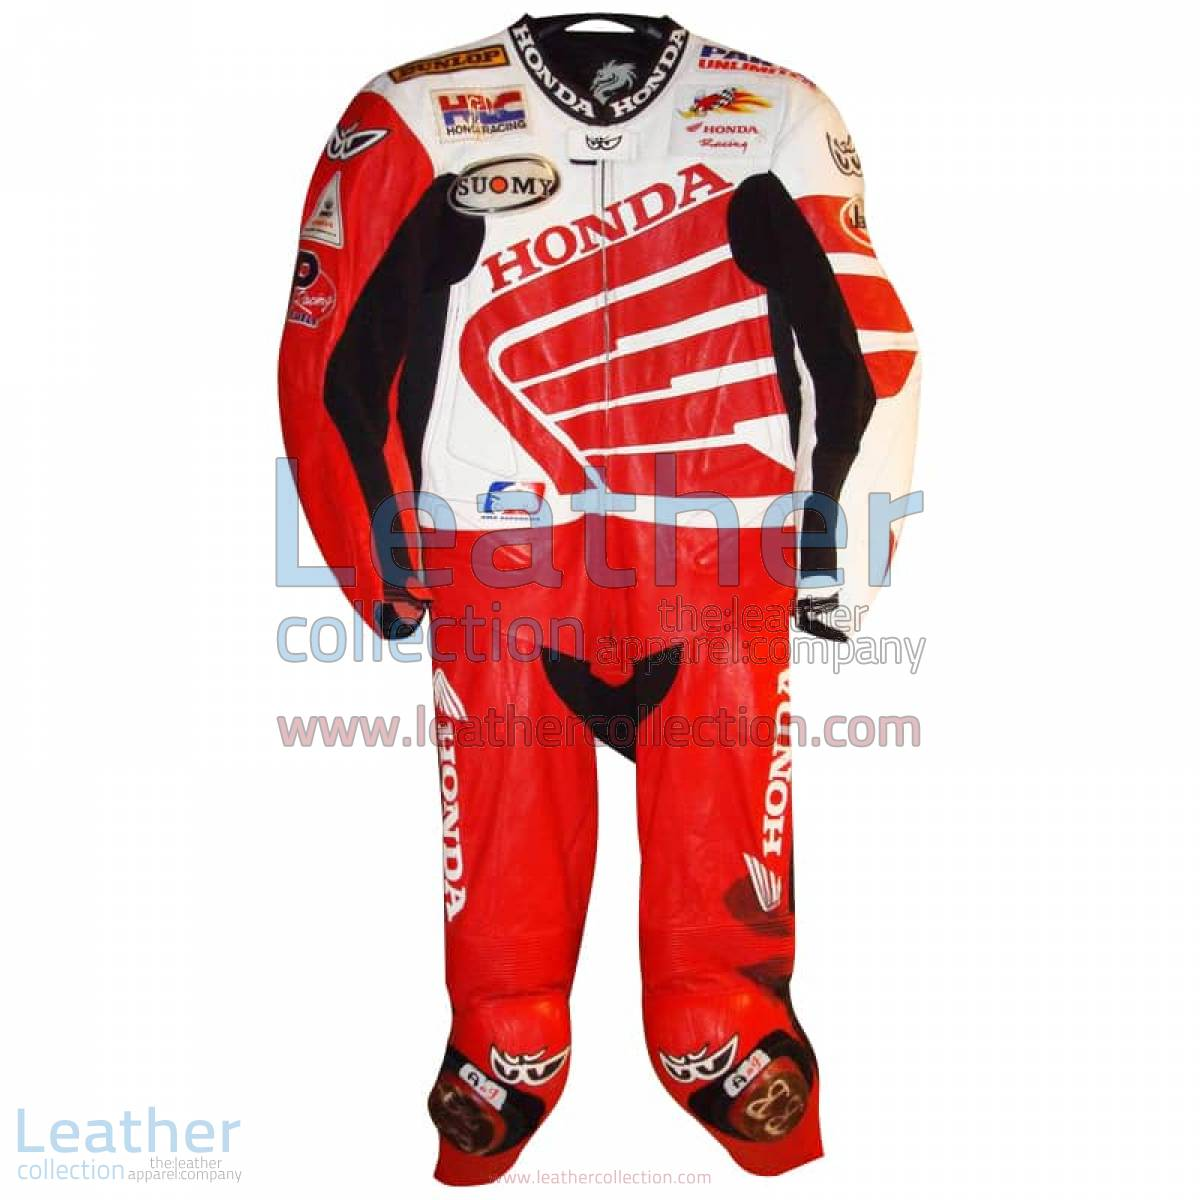 Ben Bostrom American Honda 2004 AMA Leathers | honda leathers